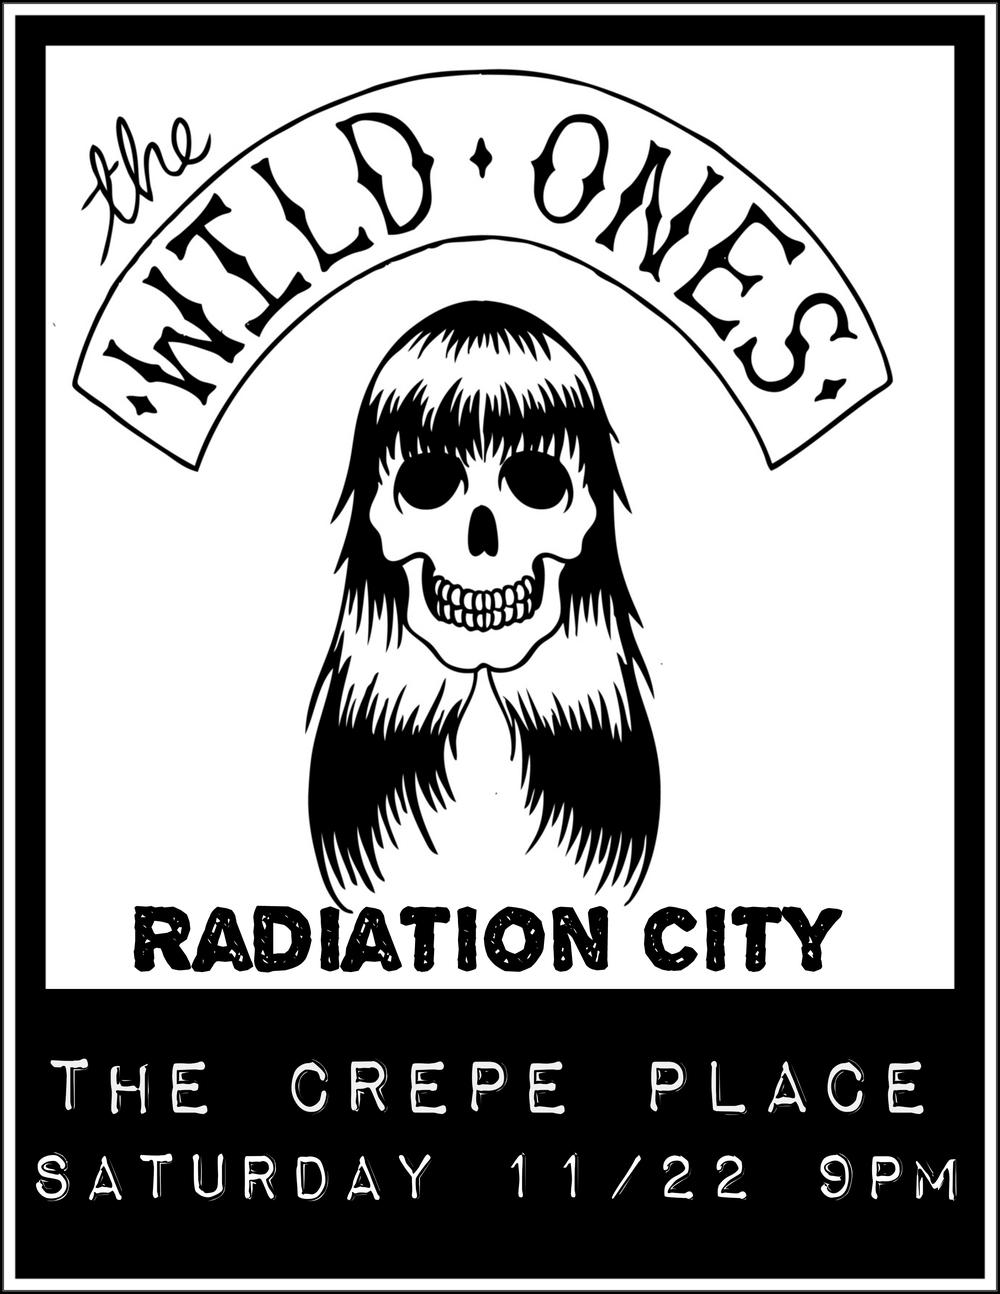 The Wild Ones 11-22-14.jpg